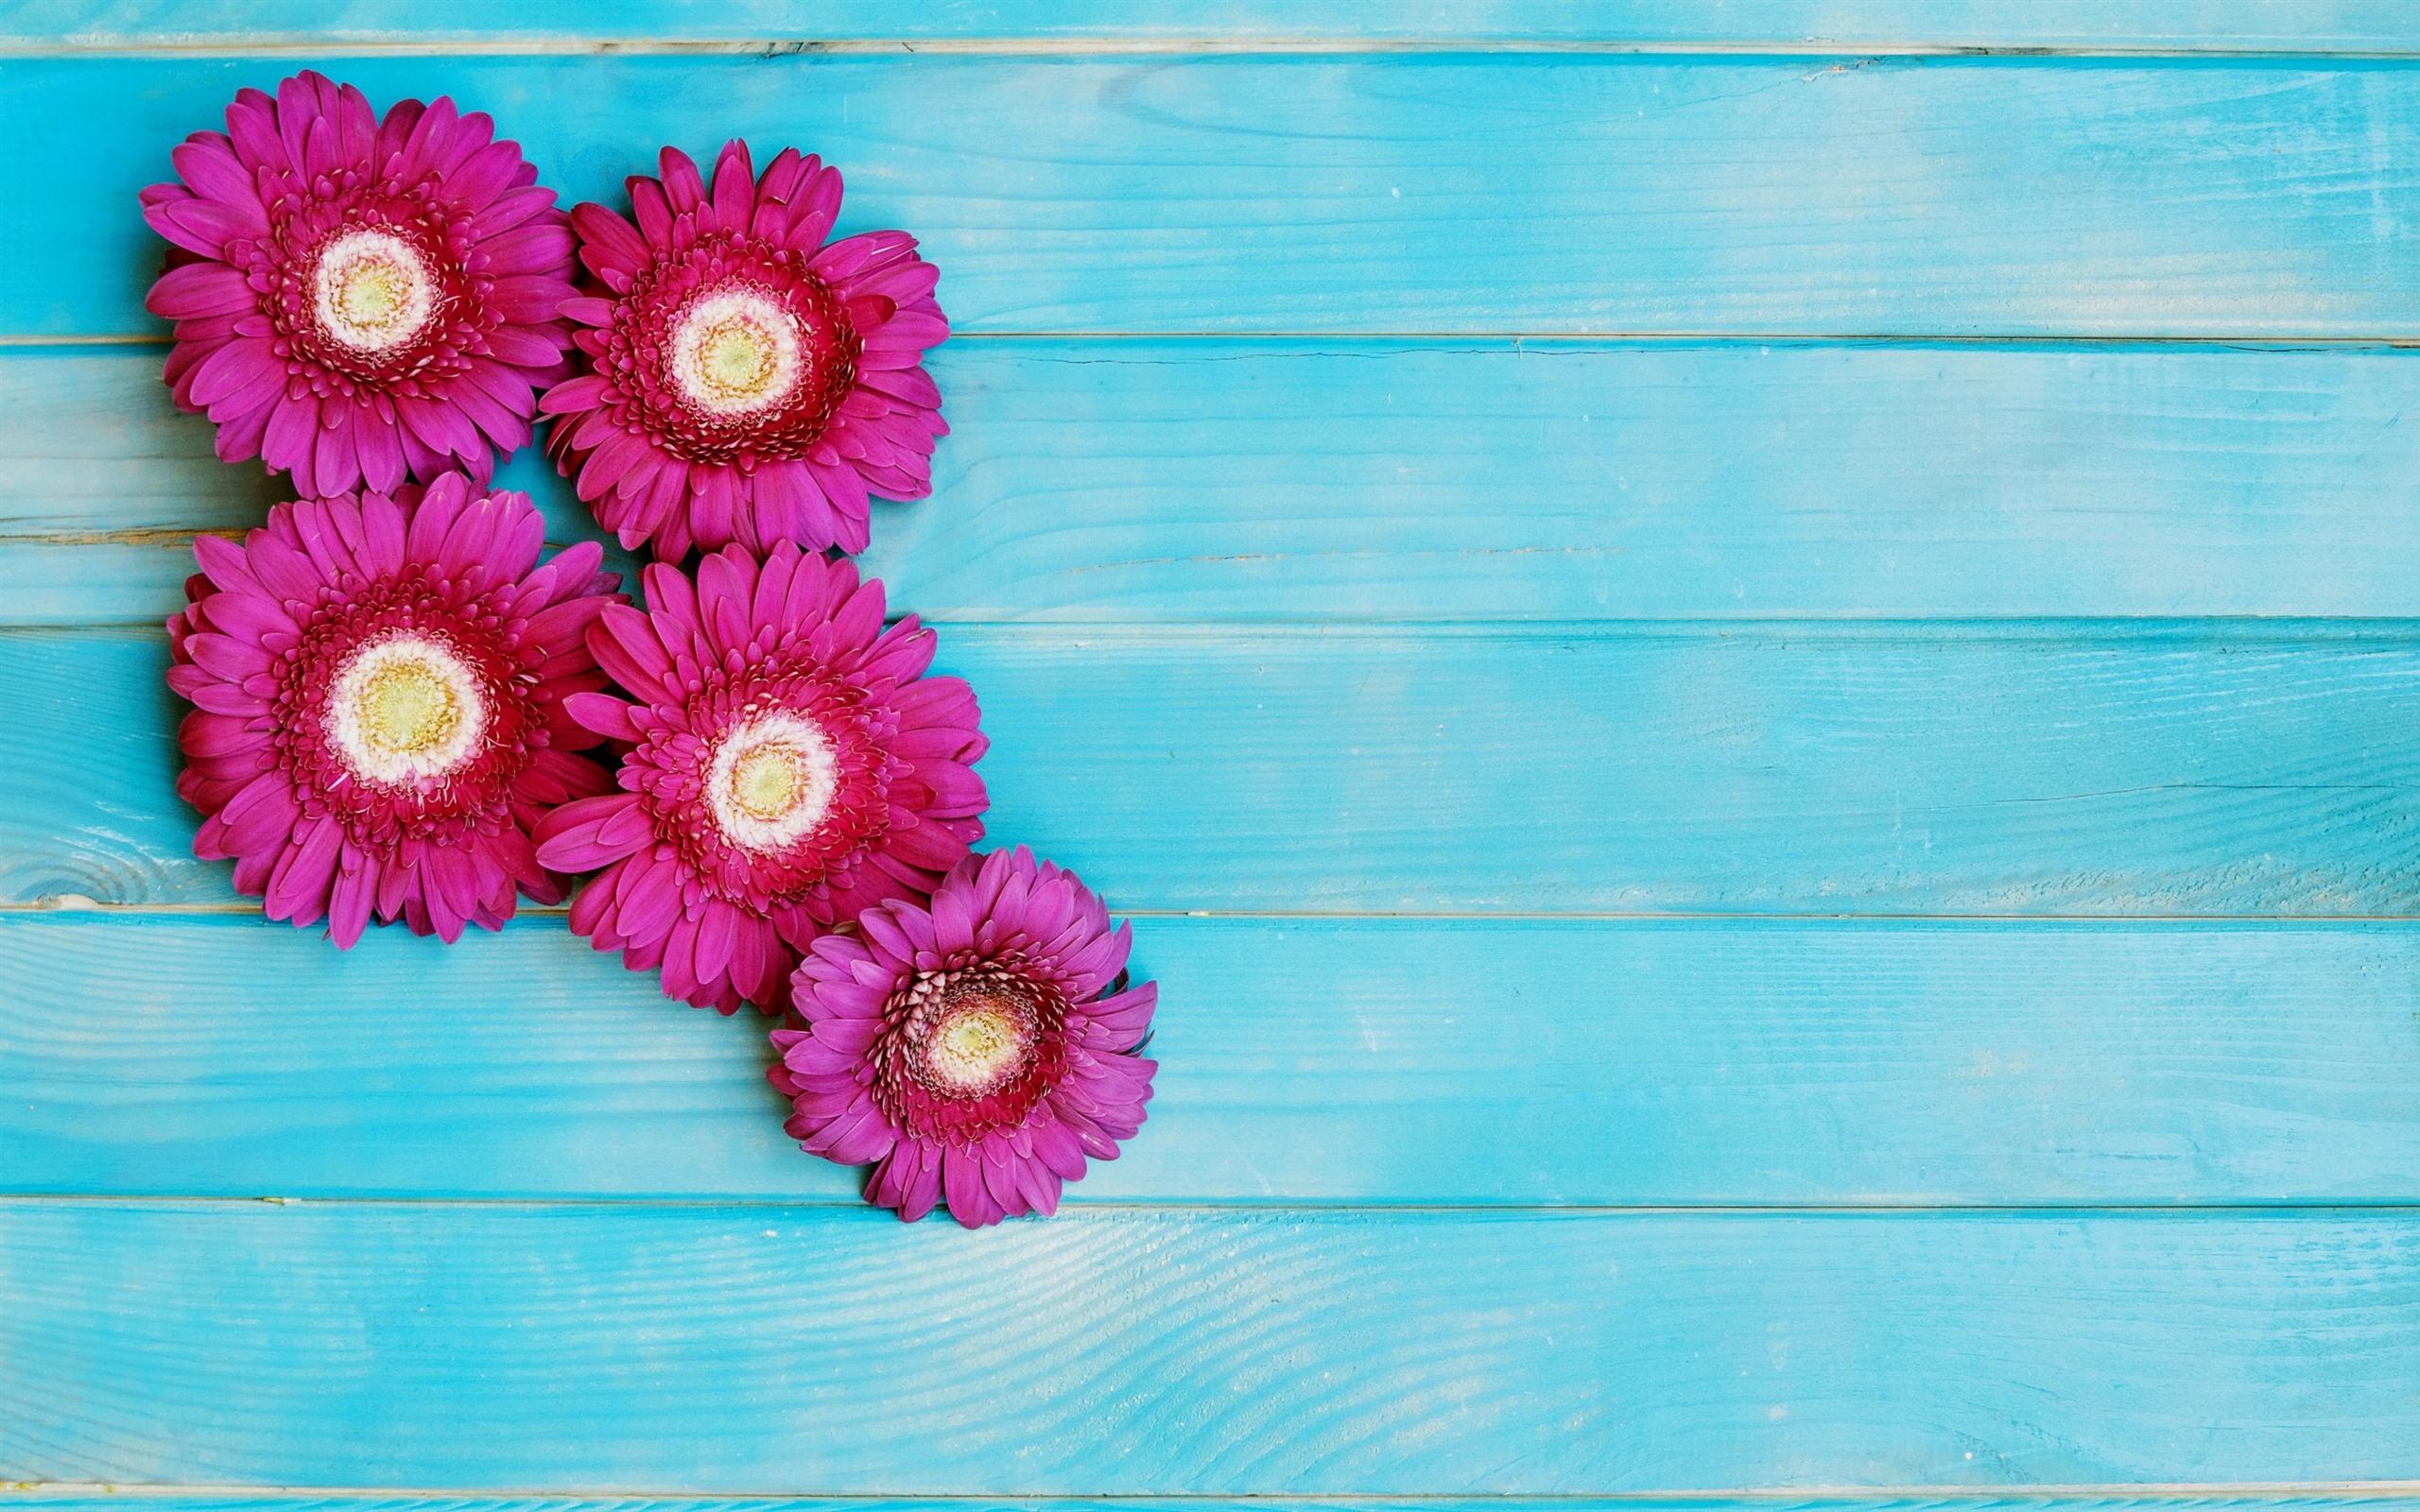 Fondos De Pantalla Rosa Rosa Flores Fondo De Madera: Fondos De Pantalla Flores Rosadas Del Gerbera, Fondo De